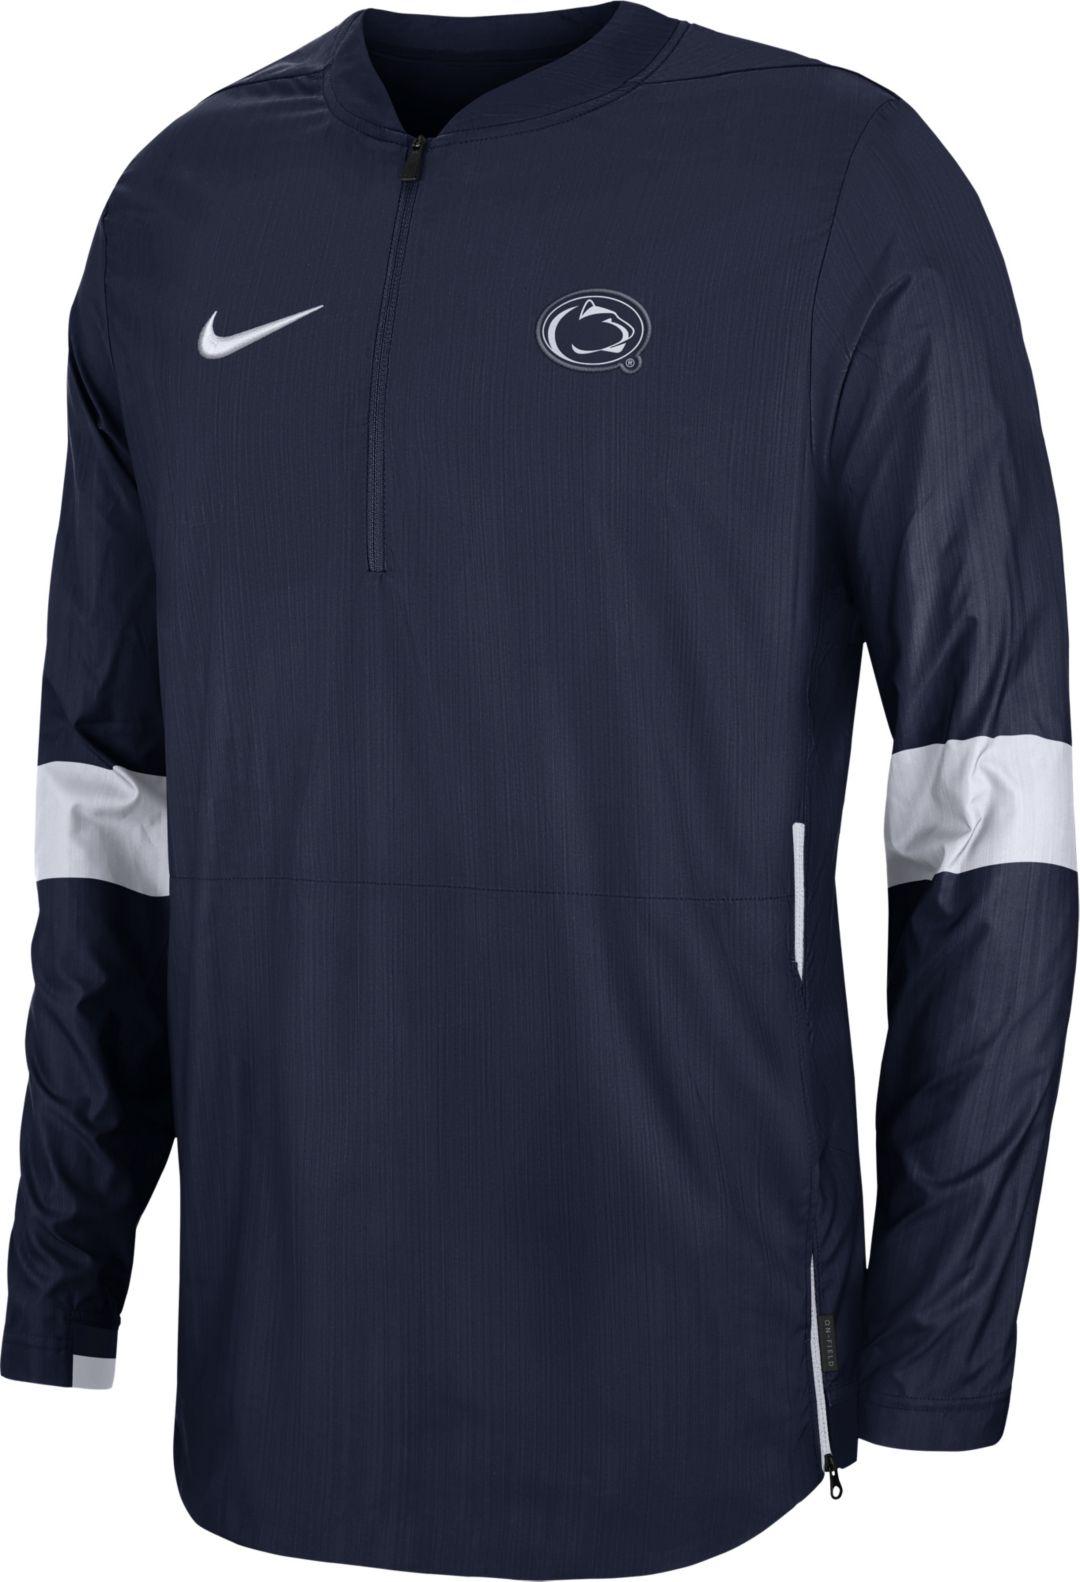 low priced 3b44b 7aefe Nike Men's Penn State Nittany Lions Blue Lockdown Half-Zip Football Jacket